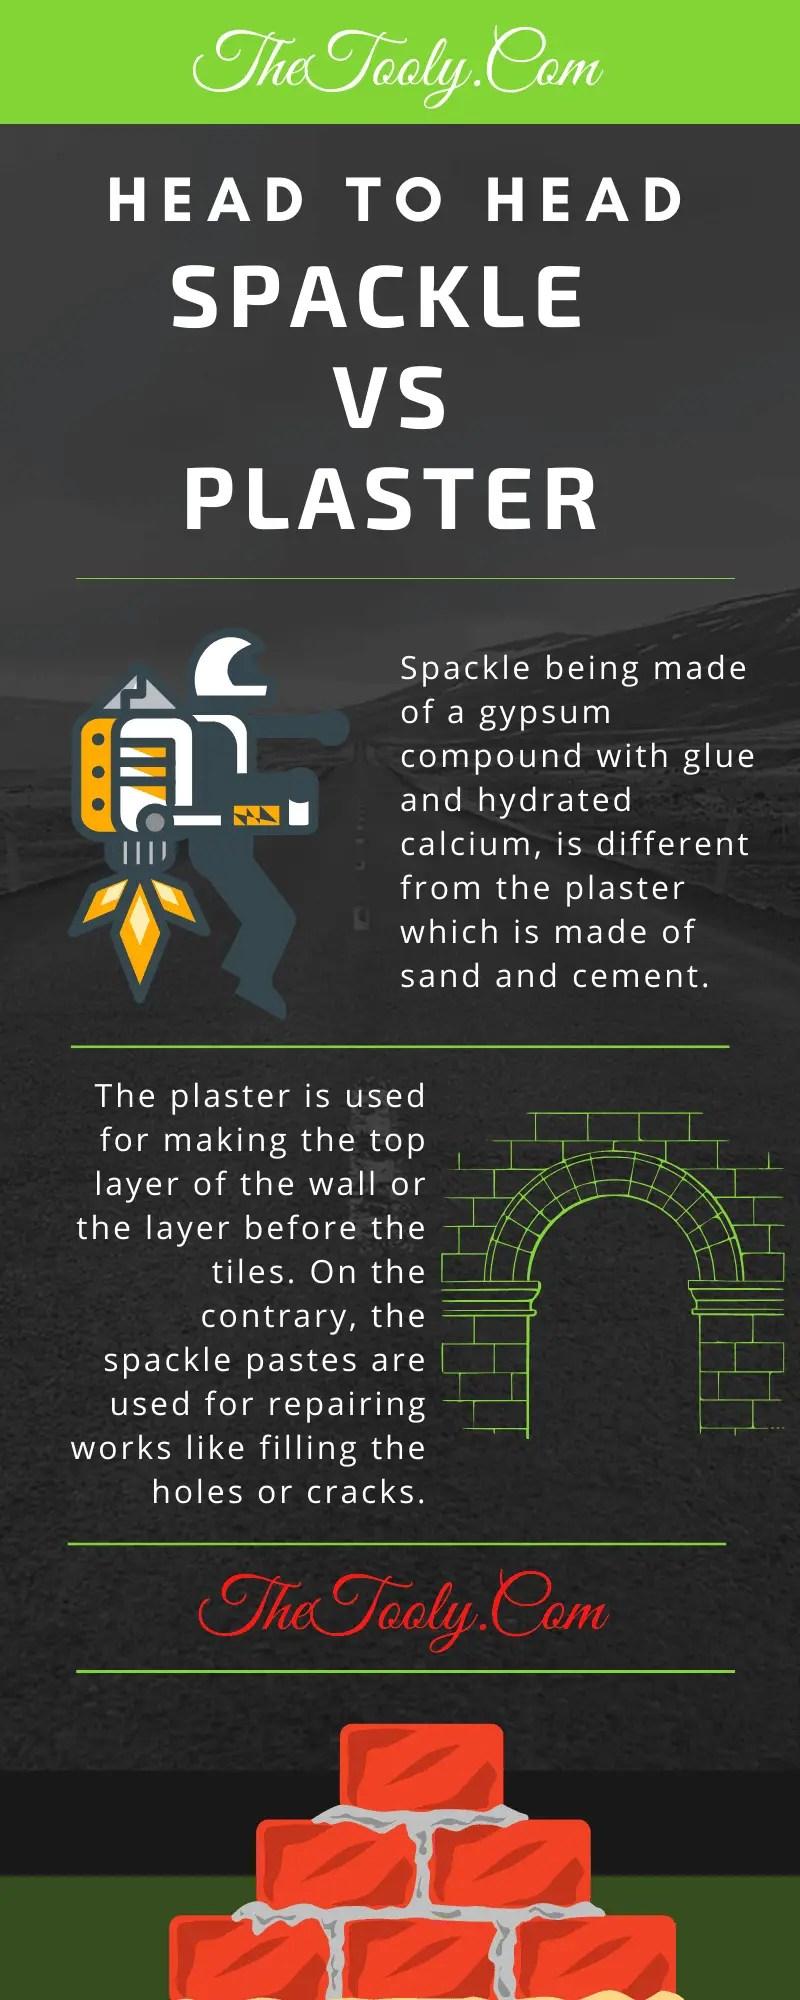 Spackle vs Plaster infographic